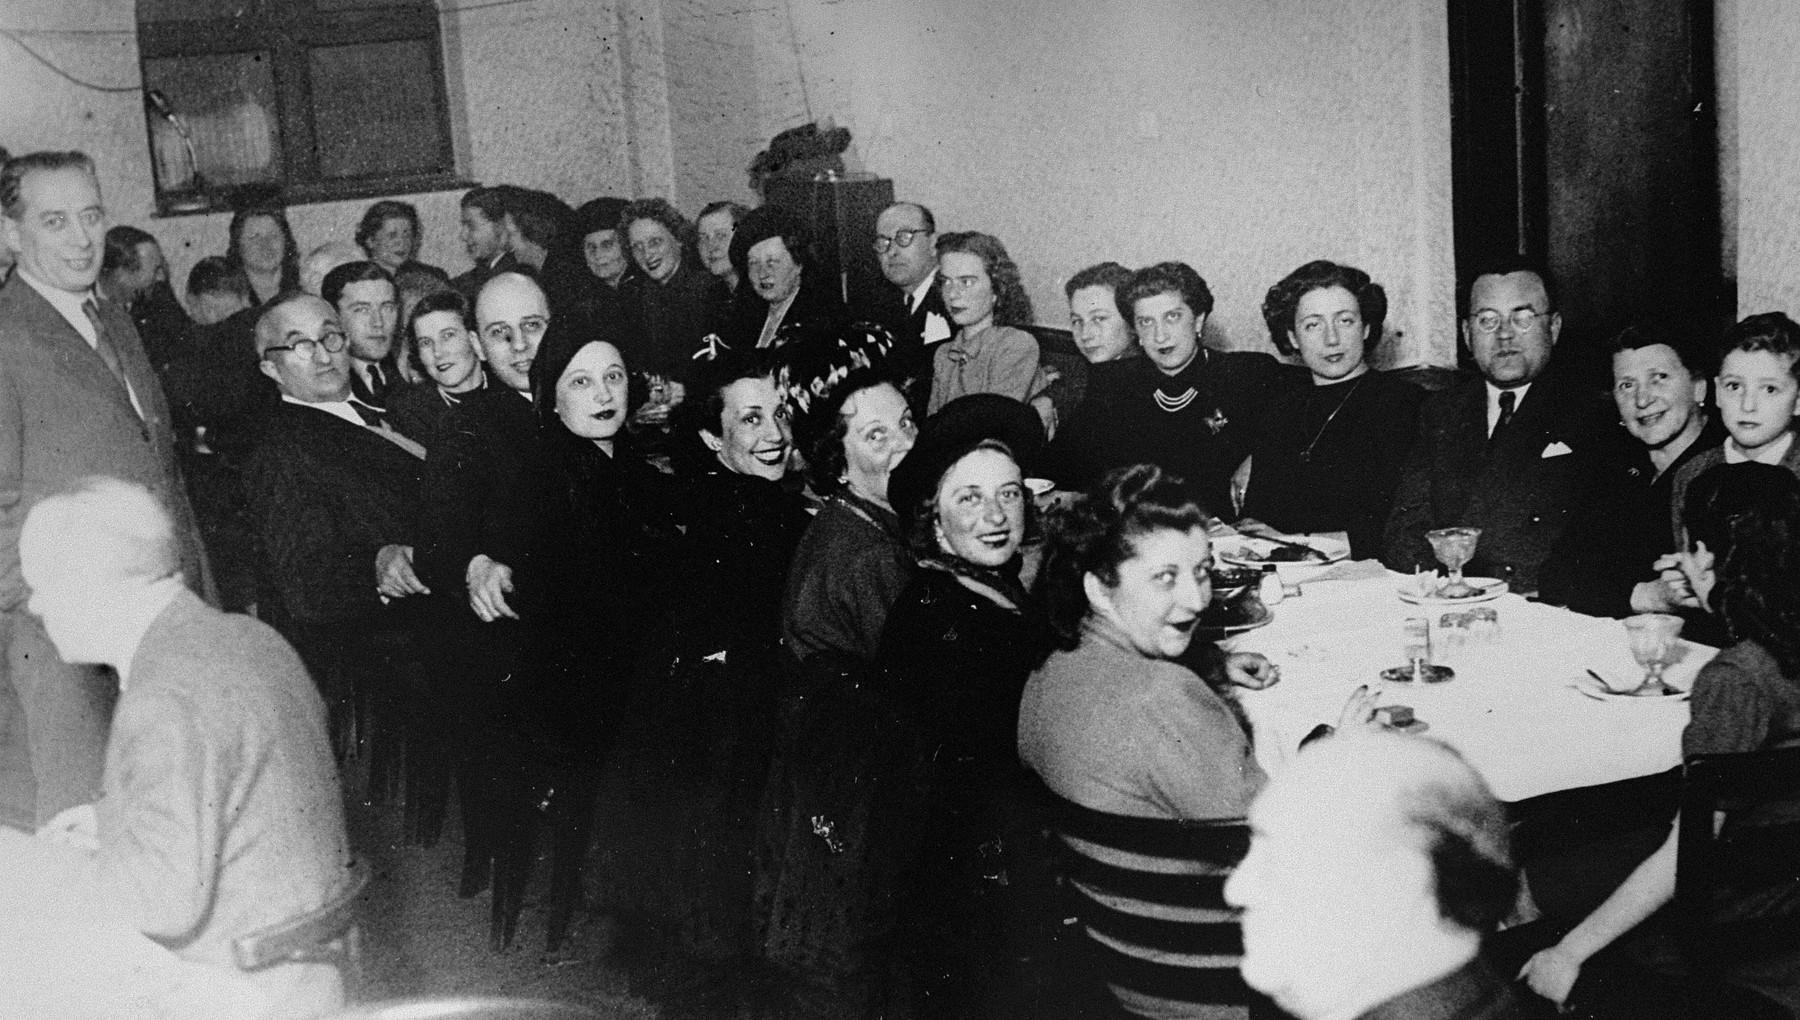 Postwar reunion of Hungarian Jewish survivors in Budapest.